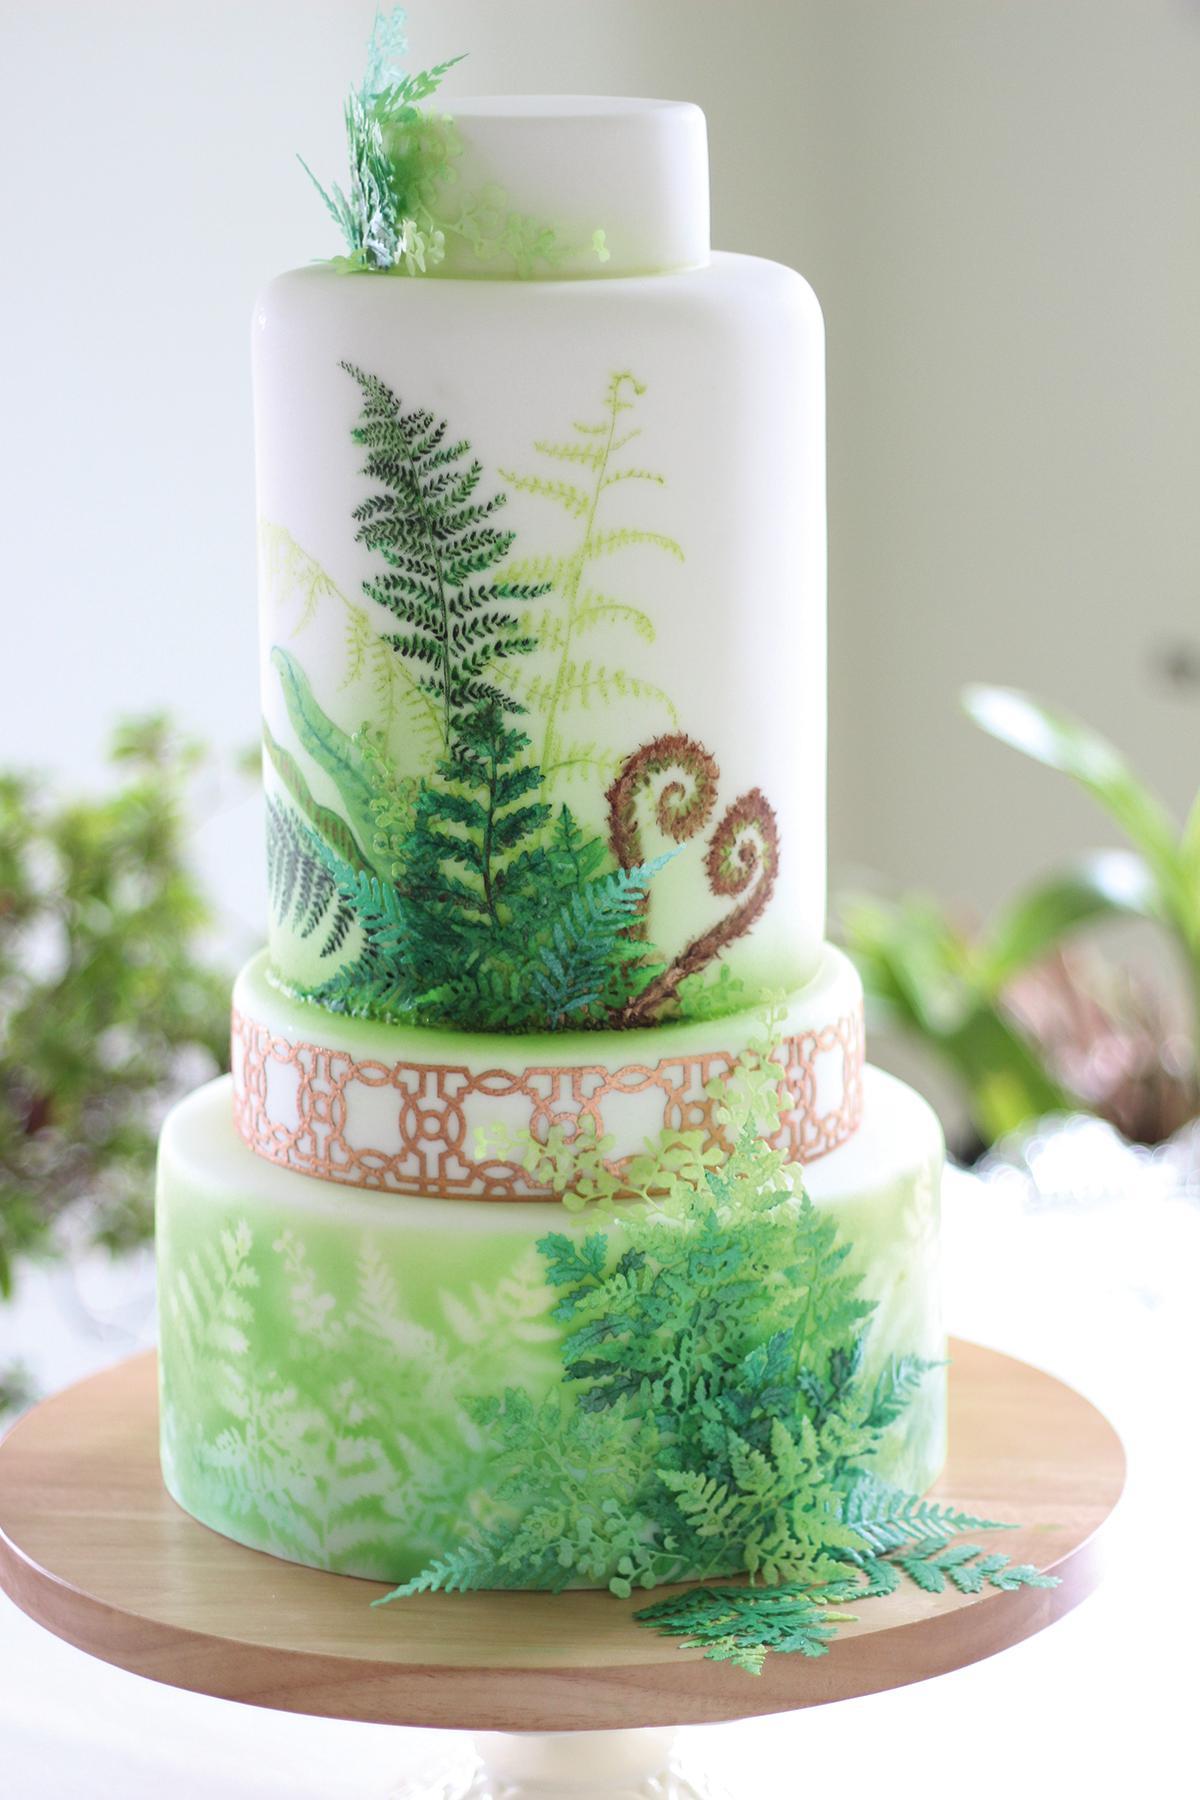 lindy-smith-fern-cake-for-botanical-wedding-shoot - Love Our Wedding